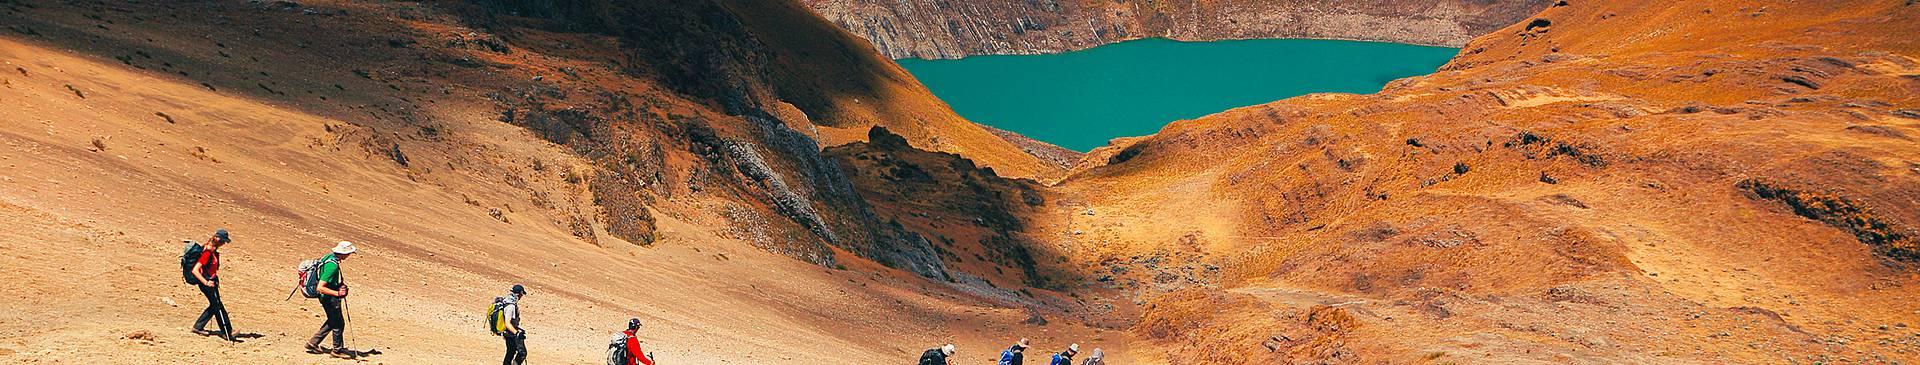 Peru guided tours